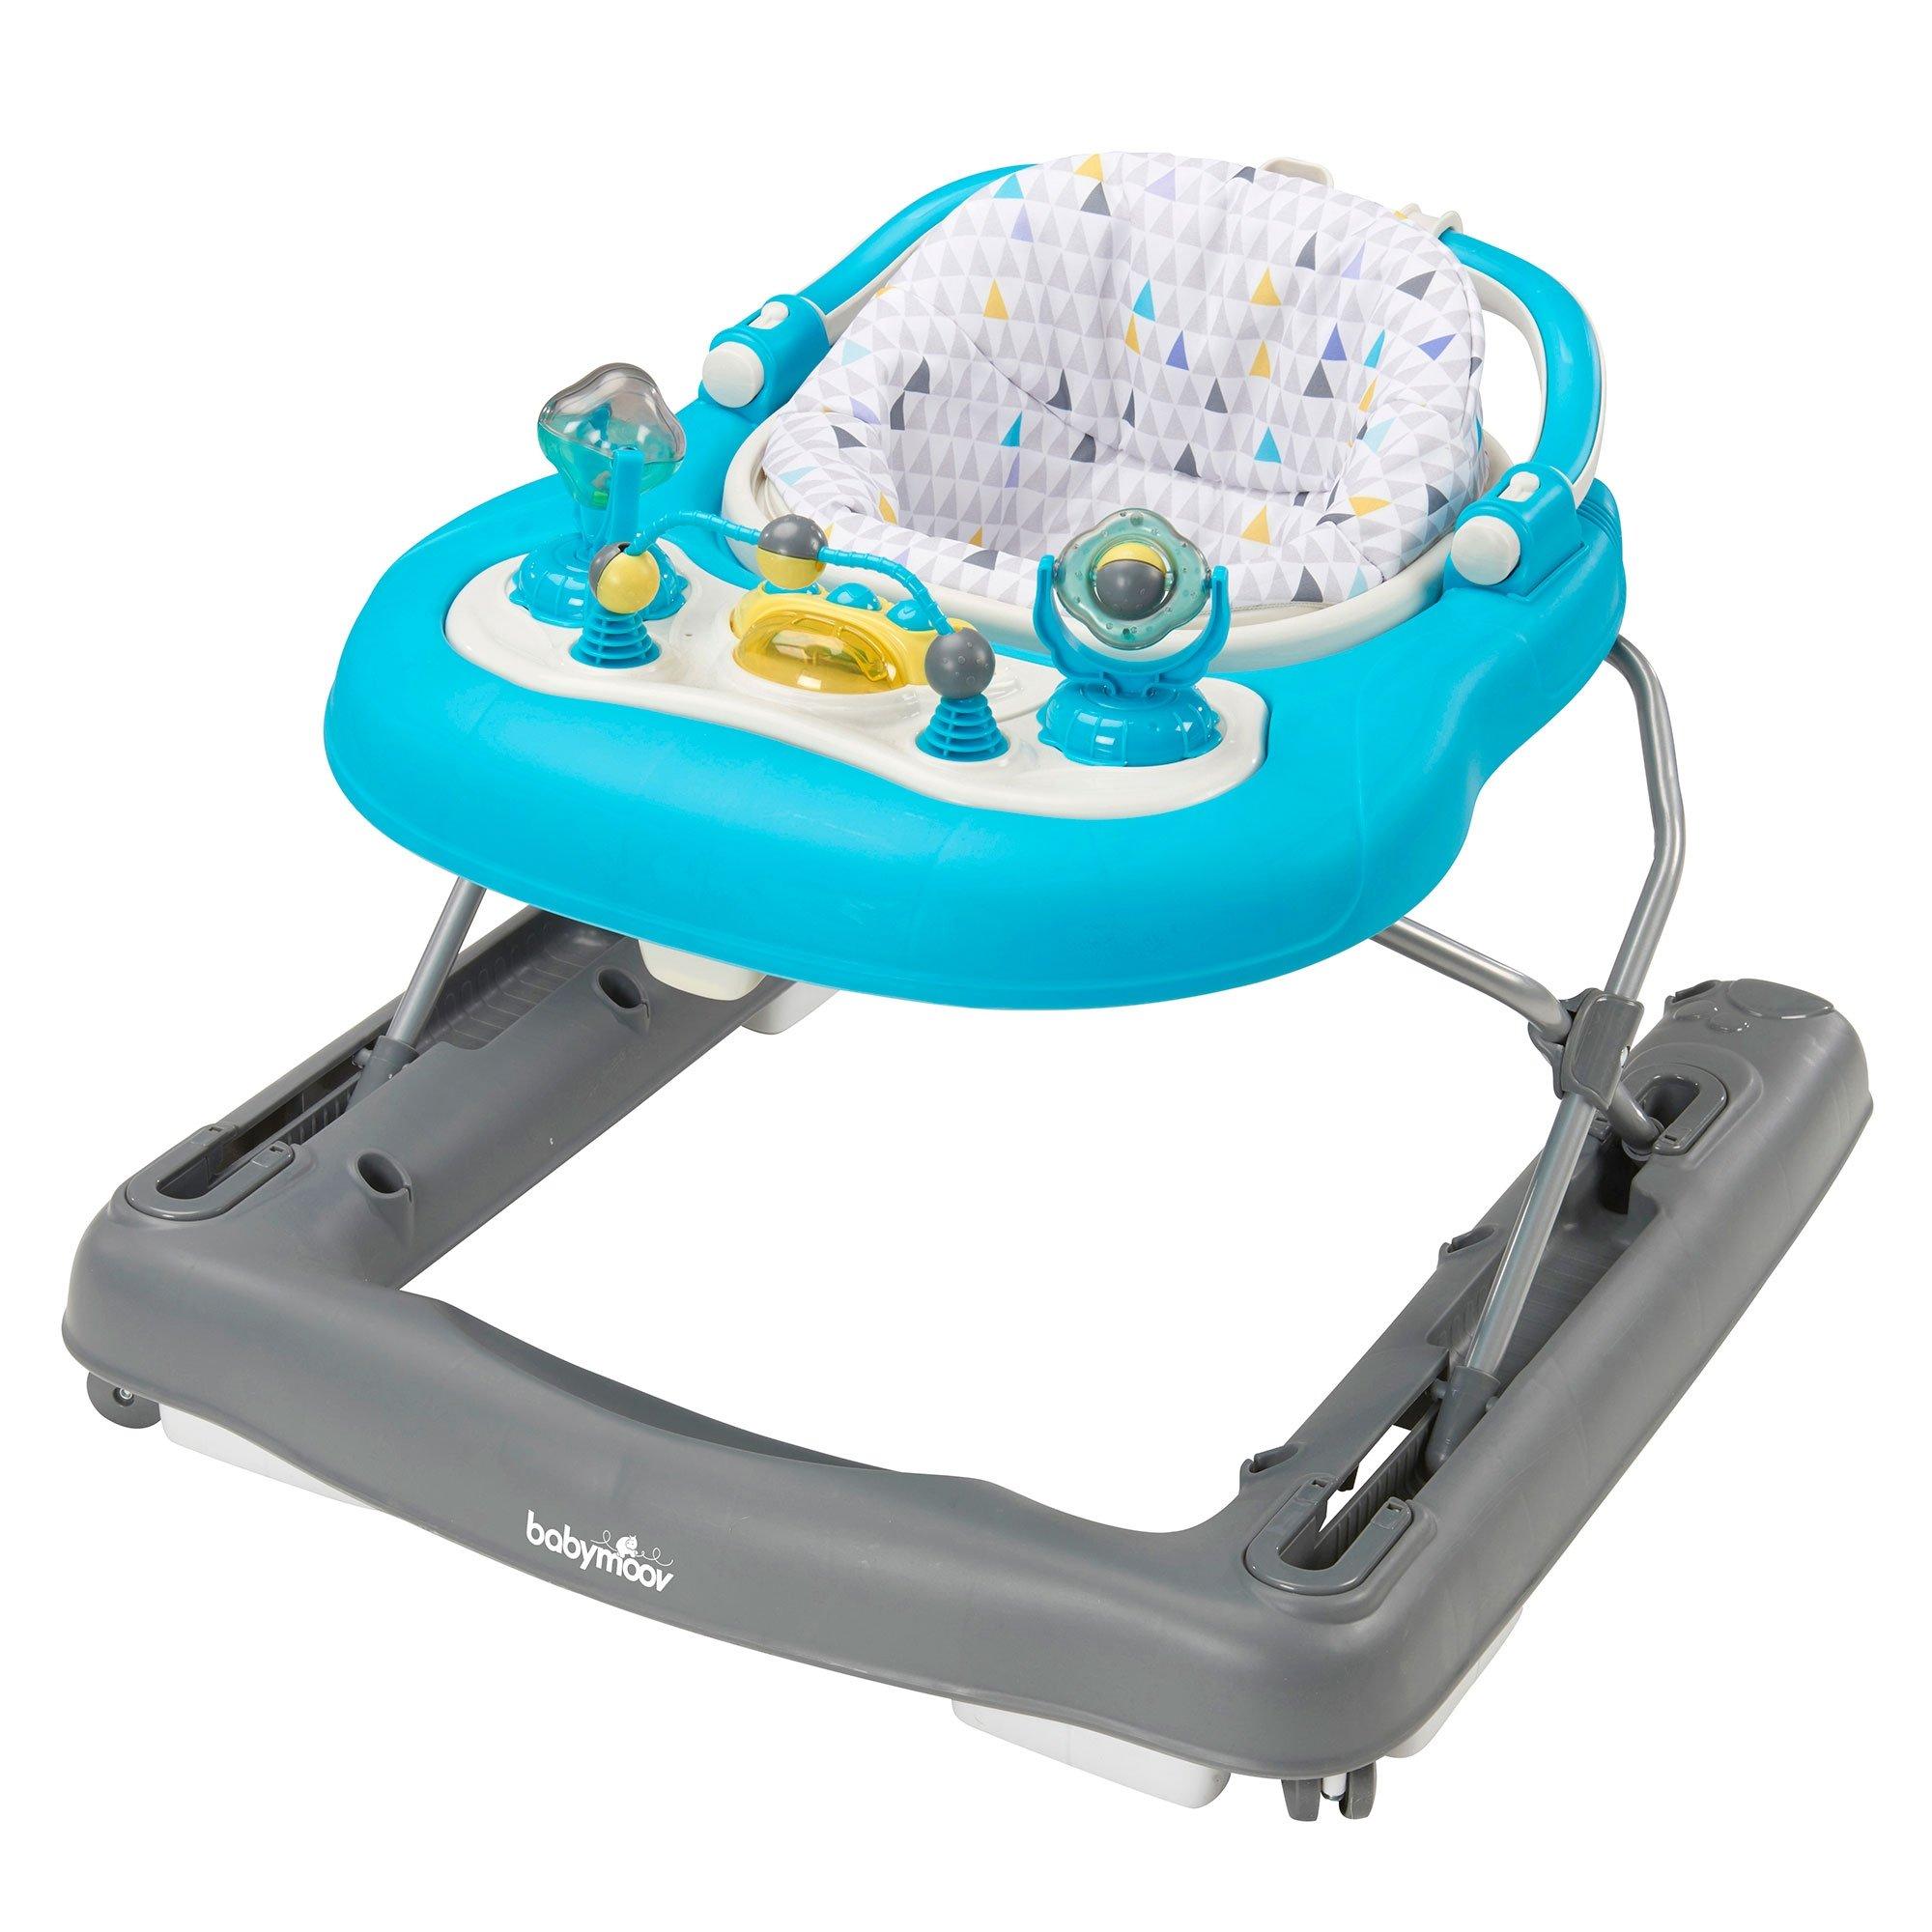 Staigulis Babymoov Baby walker 2 in 1 petrol A040007